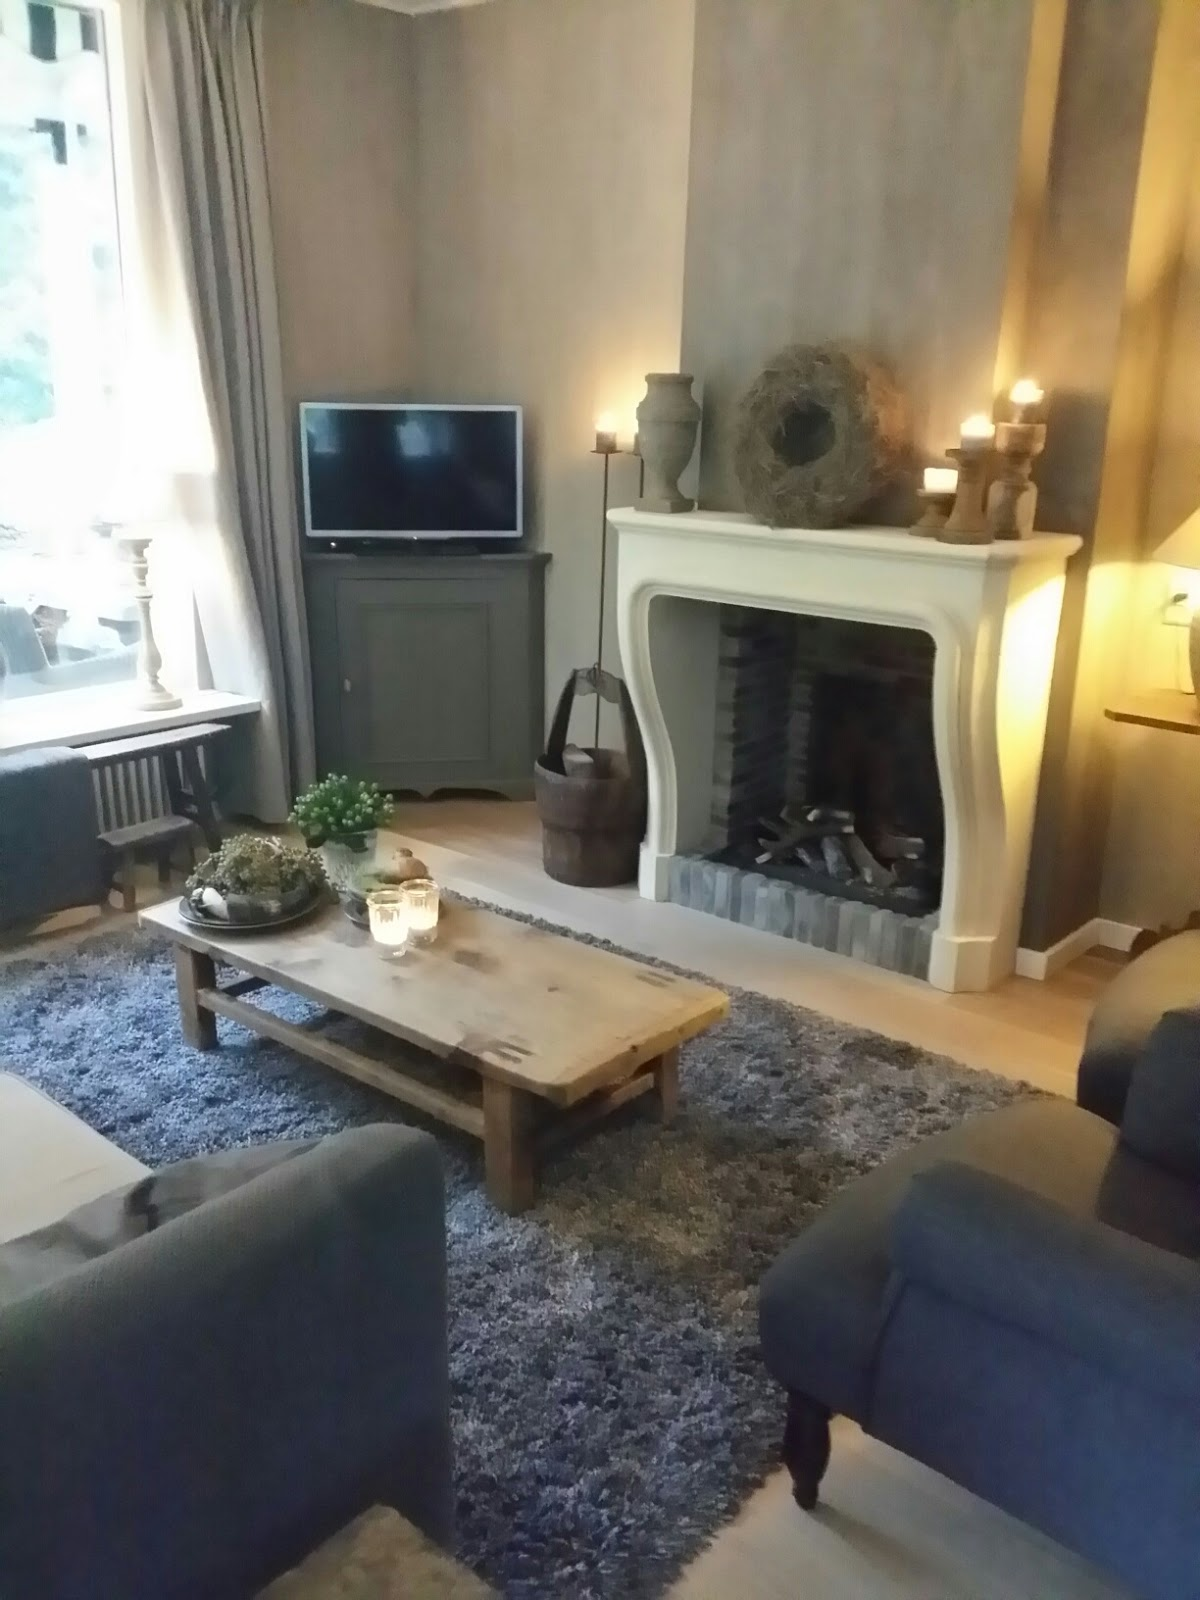 jannysblog: vloerkleed, servies en kaarsen.....